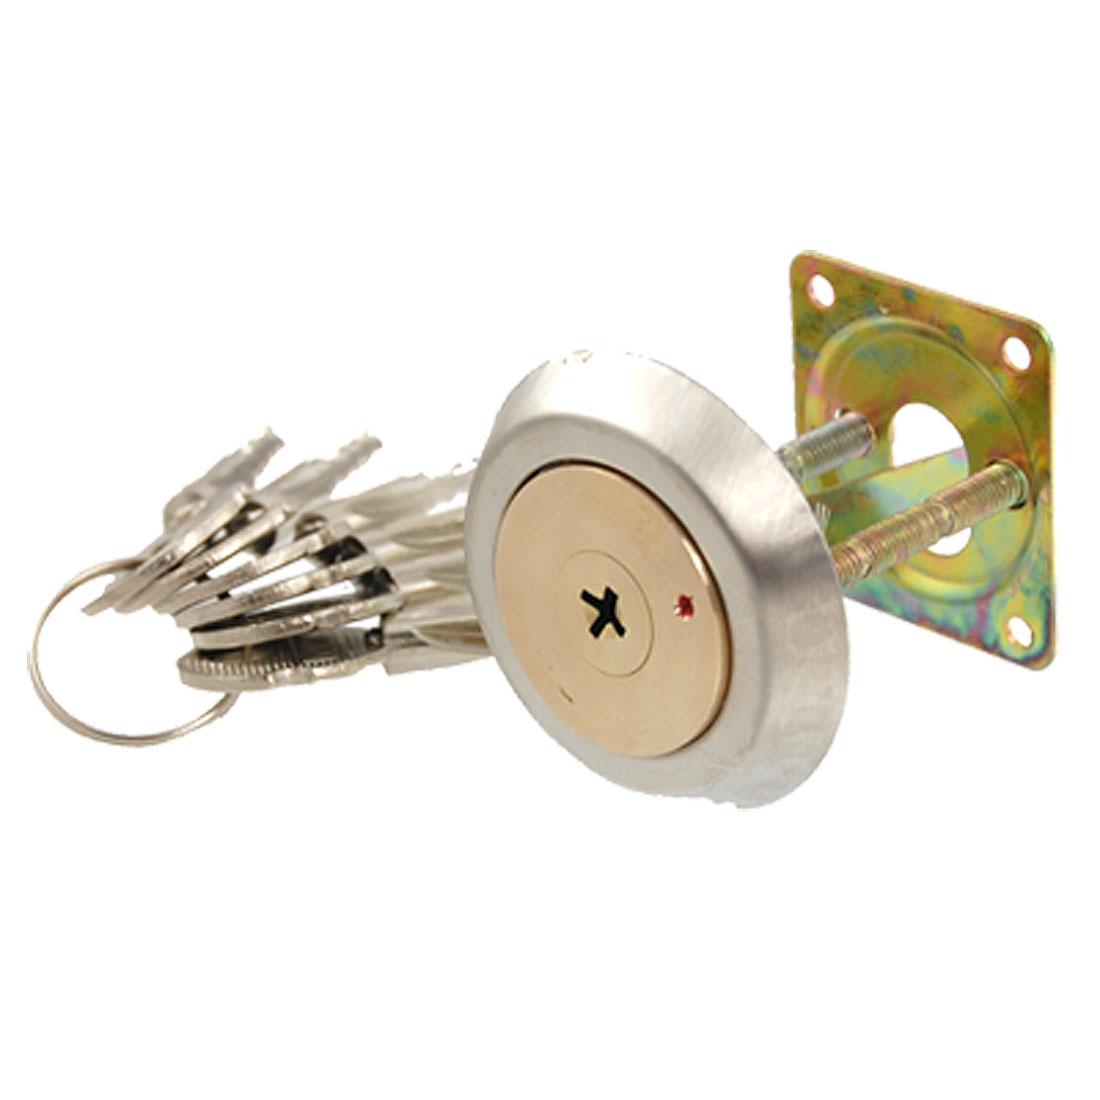 Mortise Gate Cross Keyhole Tapered Ned Door Lock w Keys